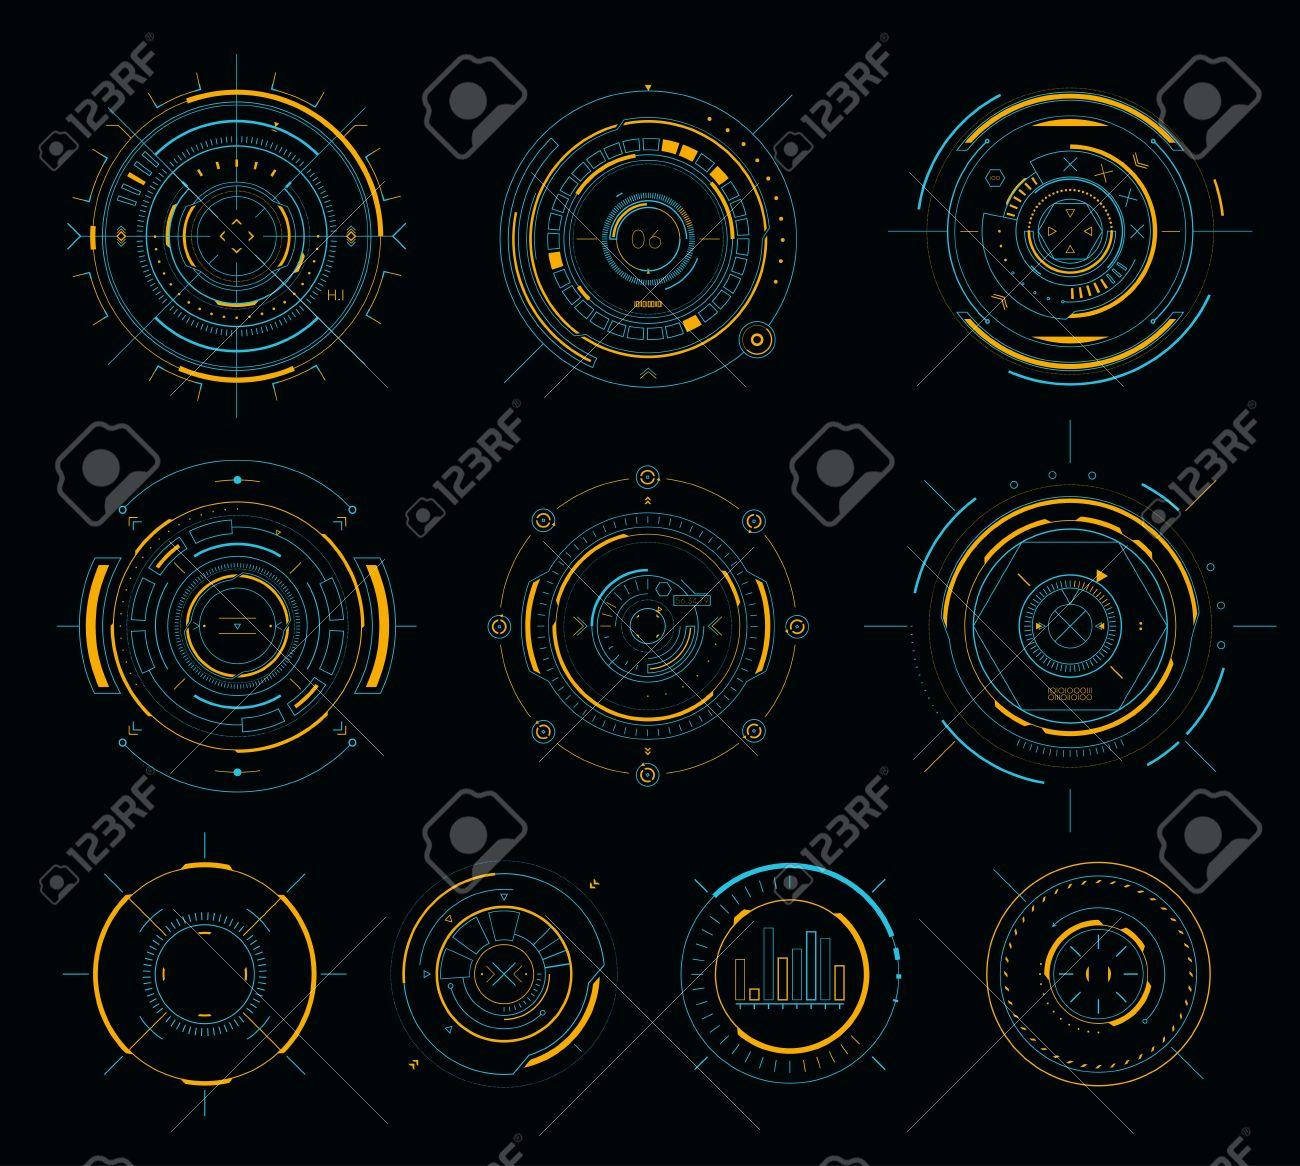 Vector sci-fi display circular elements, HUD futuristic user interface - 75942869